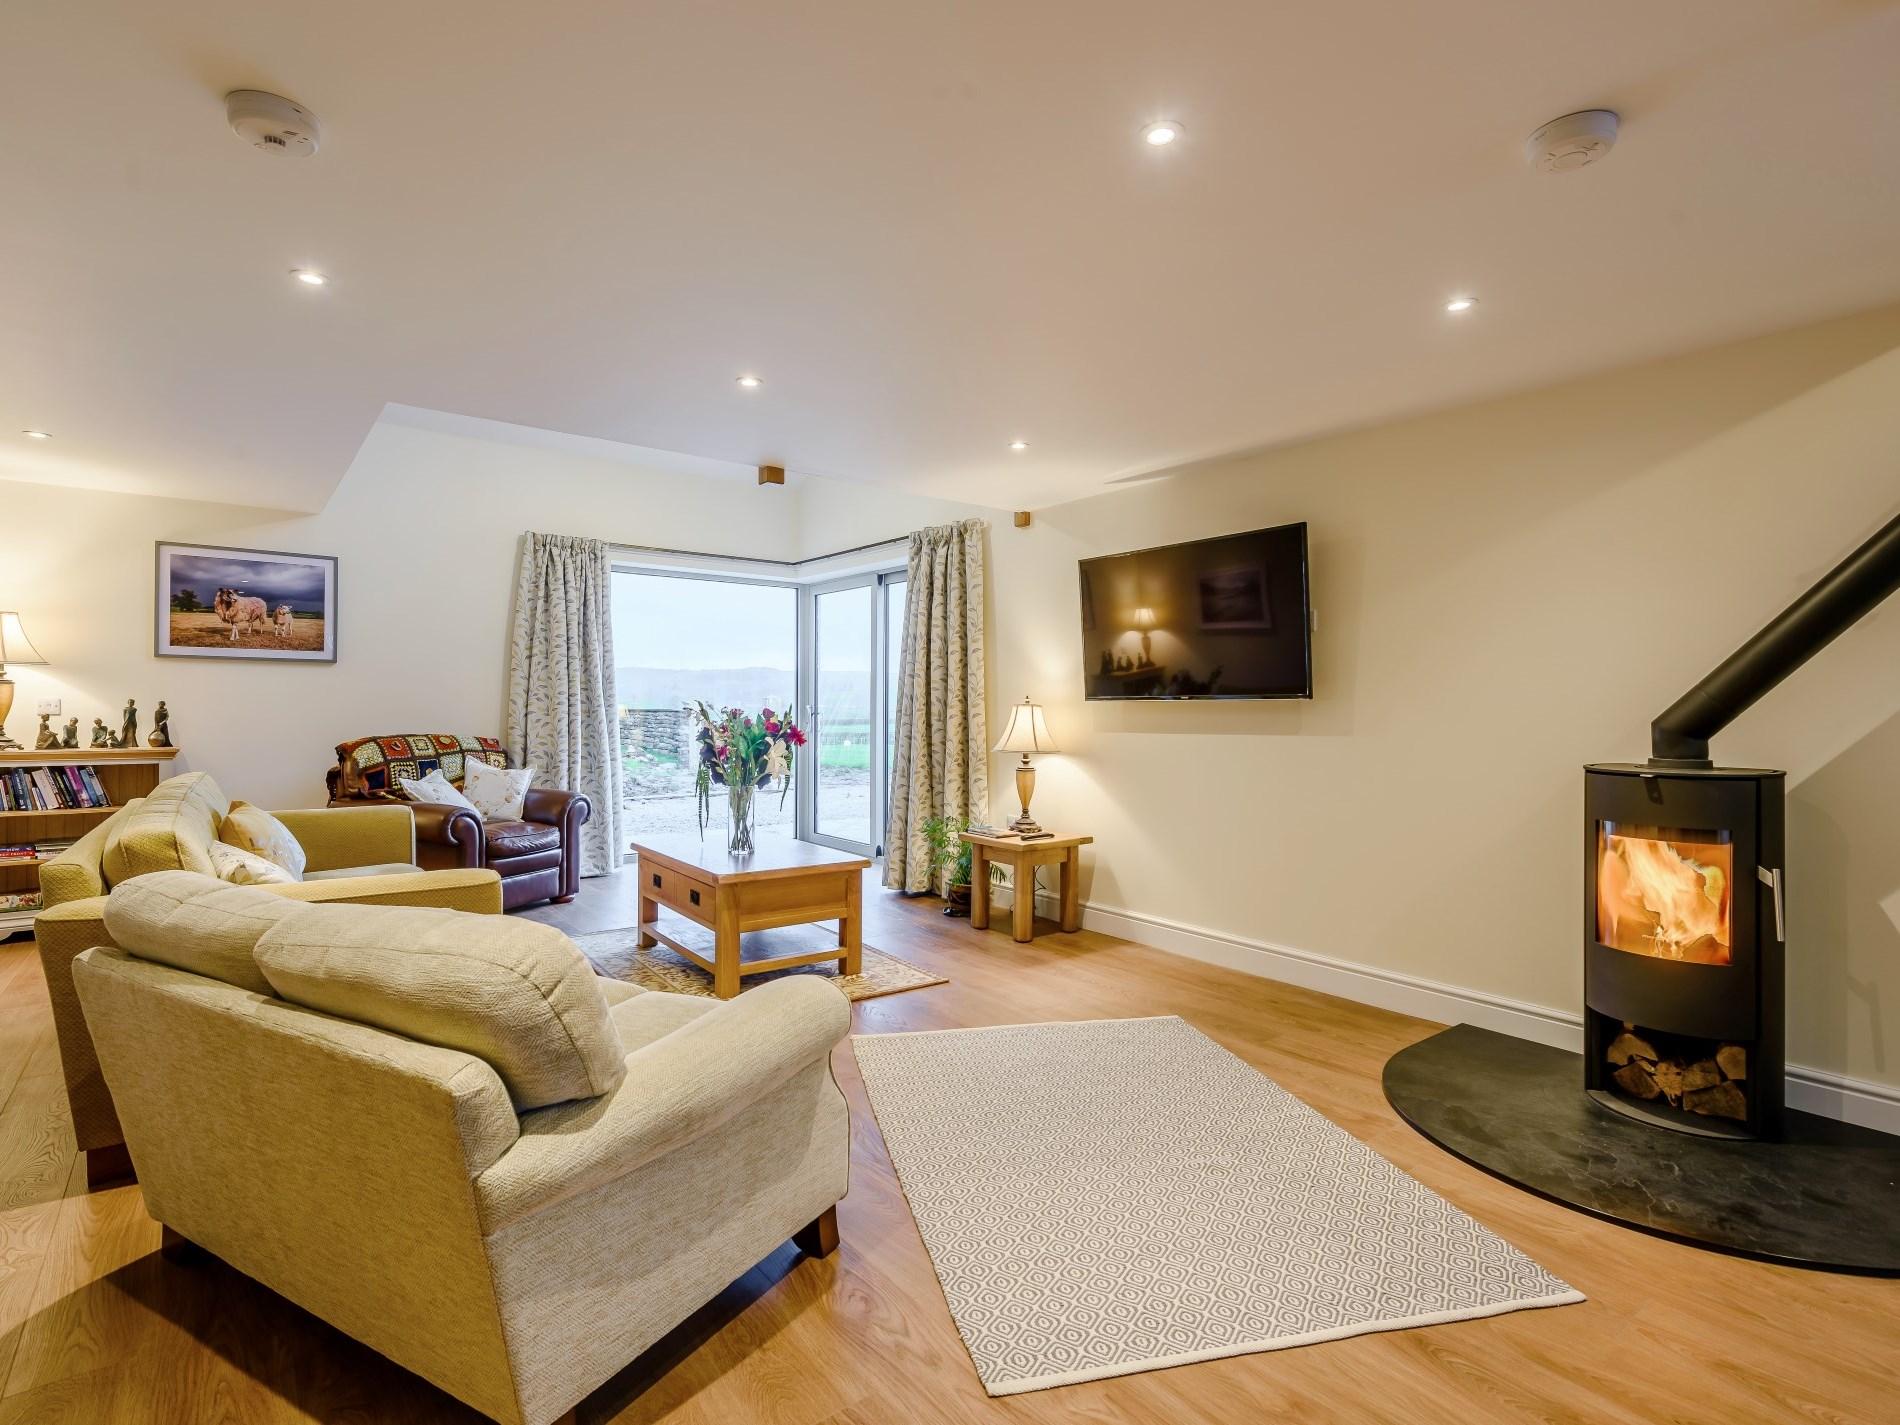 4 Bedroom Cottage in Carnforth, Yorkshire Dales